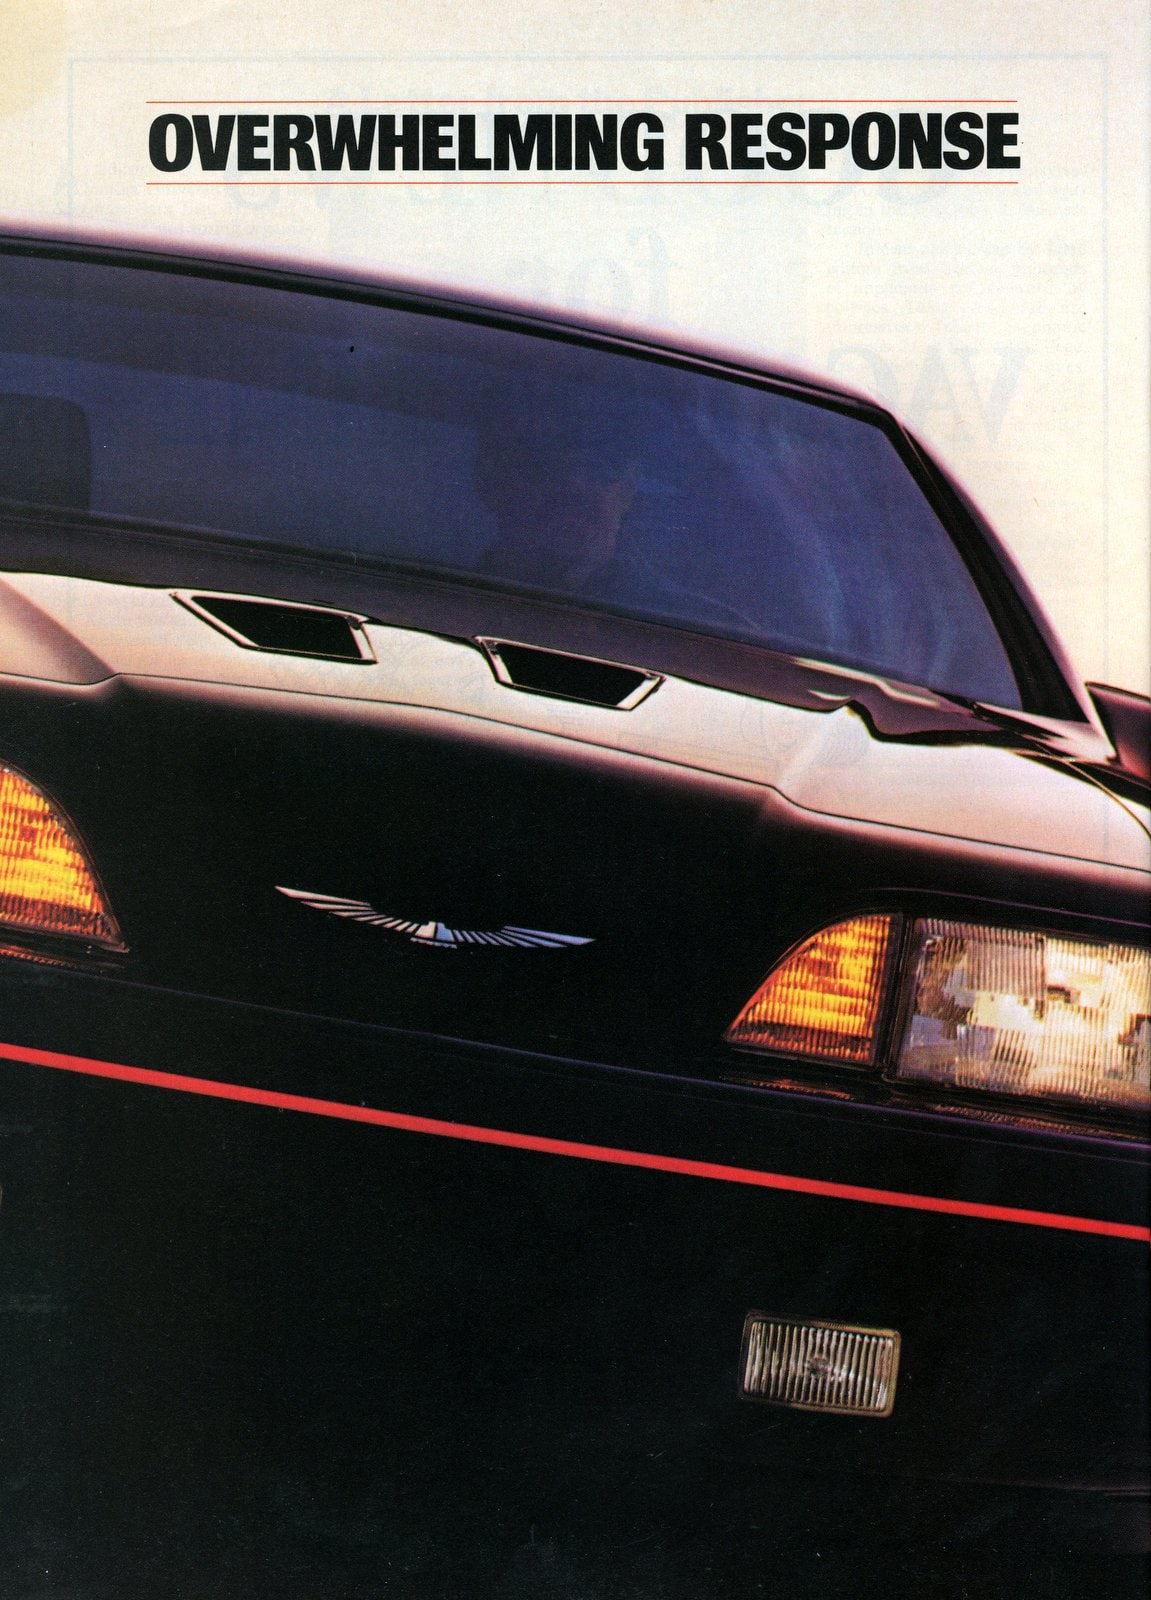 Vintage Ford Thunderbird cars - 1987 (2)